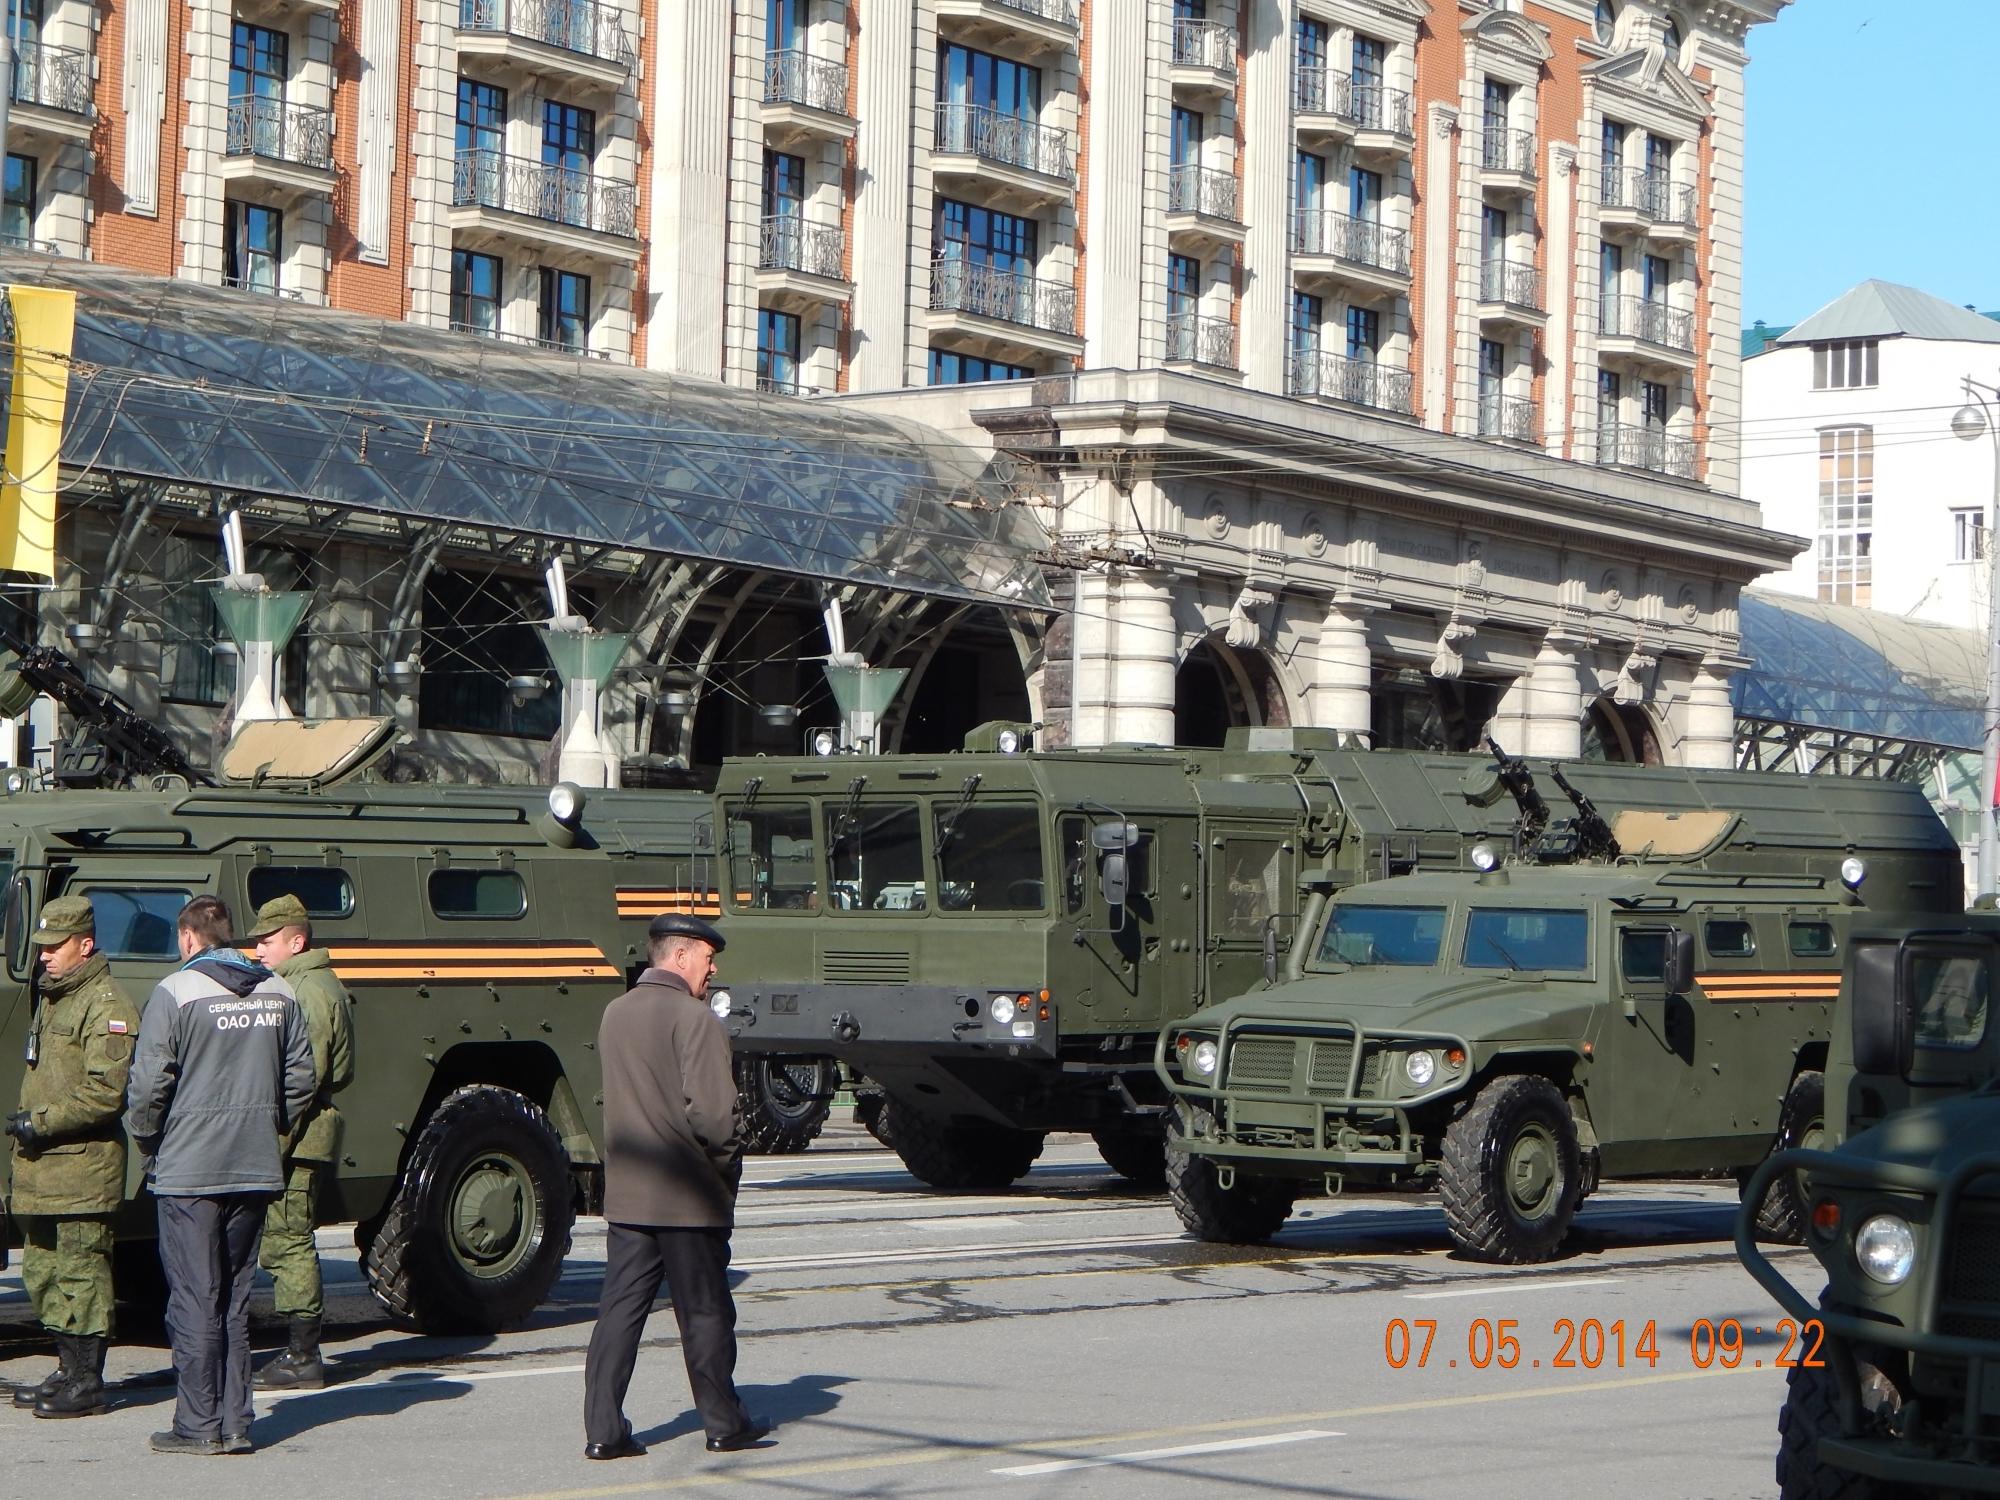 Последний прогон перед Парадом Победы 9 мая 2014.